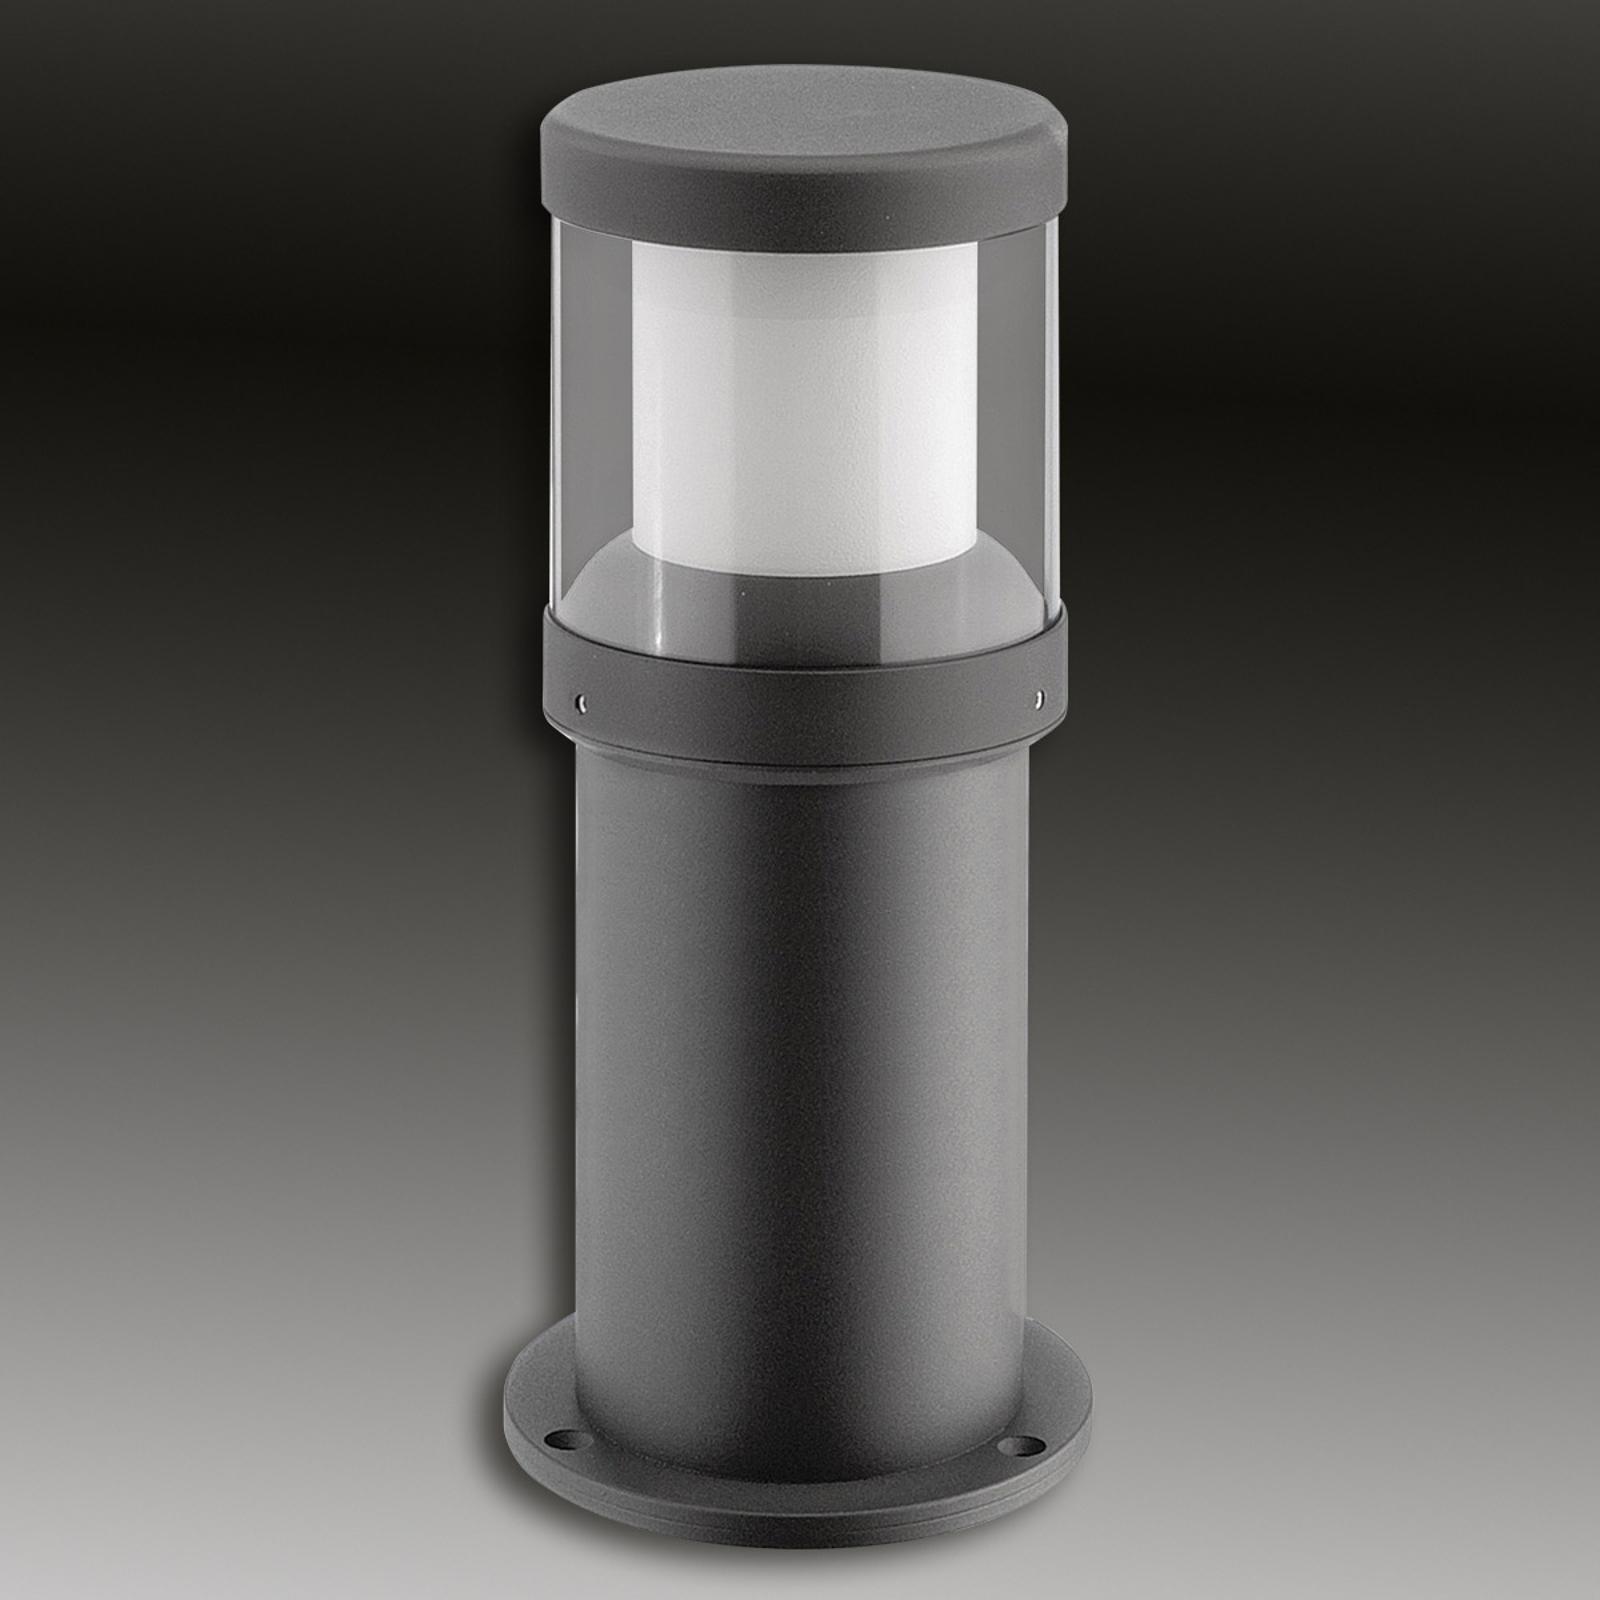 Gepoedercoate LED sokkellamp Levent - IP65